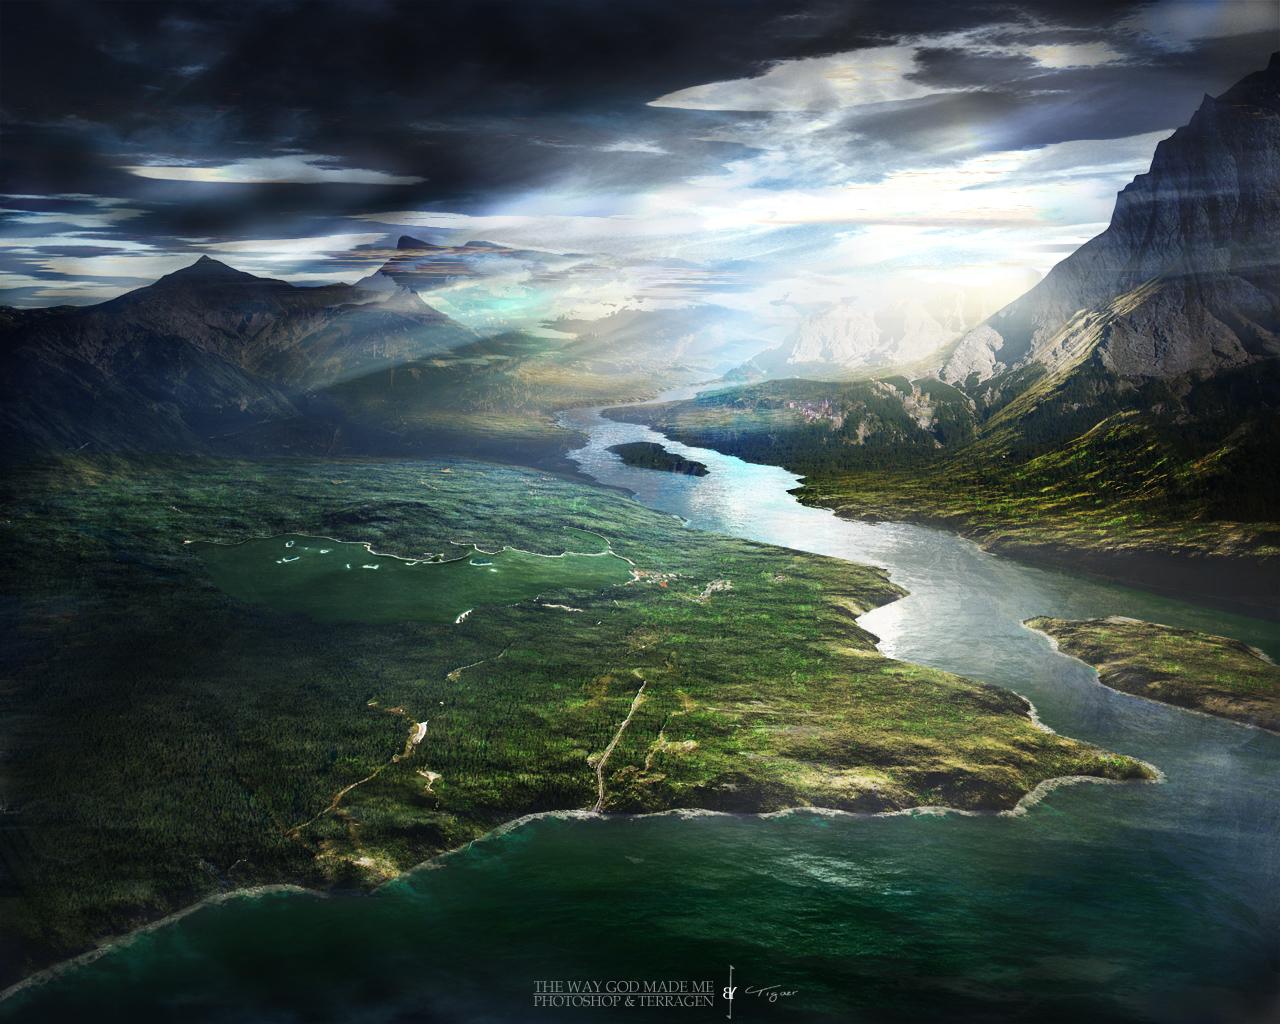 http://3.bp.blogspot.com/-5Qq-OXsKu1M/T4EzqFfkbmI/AAAAAAAADmA/oG8vbj6v37I/s1600/Naturaleza.jpg